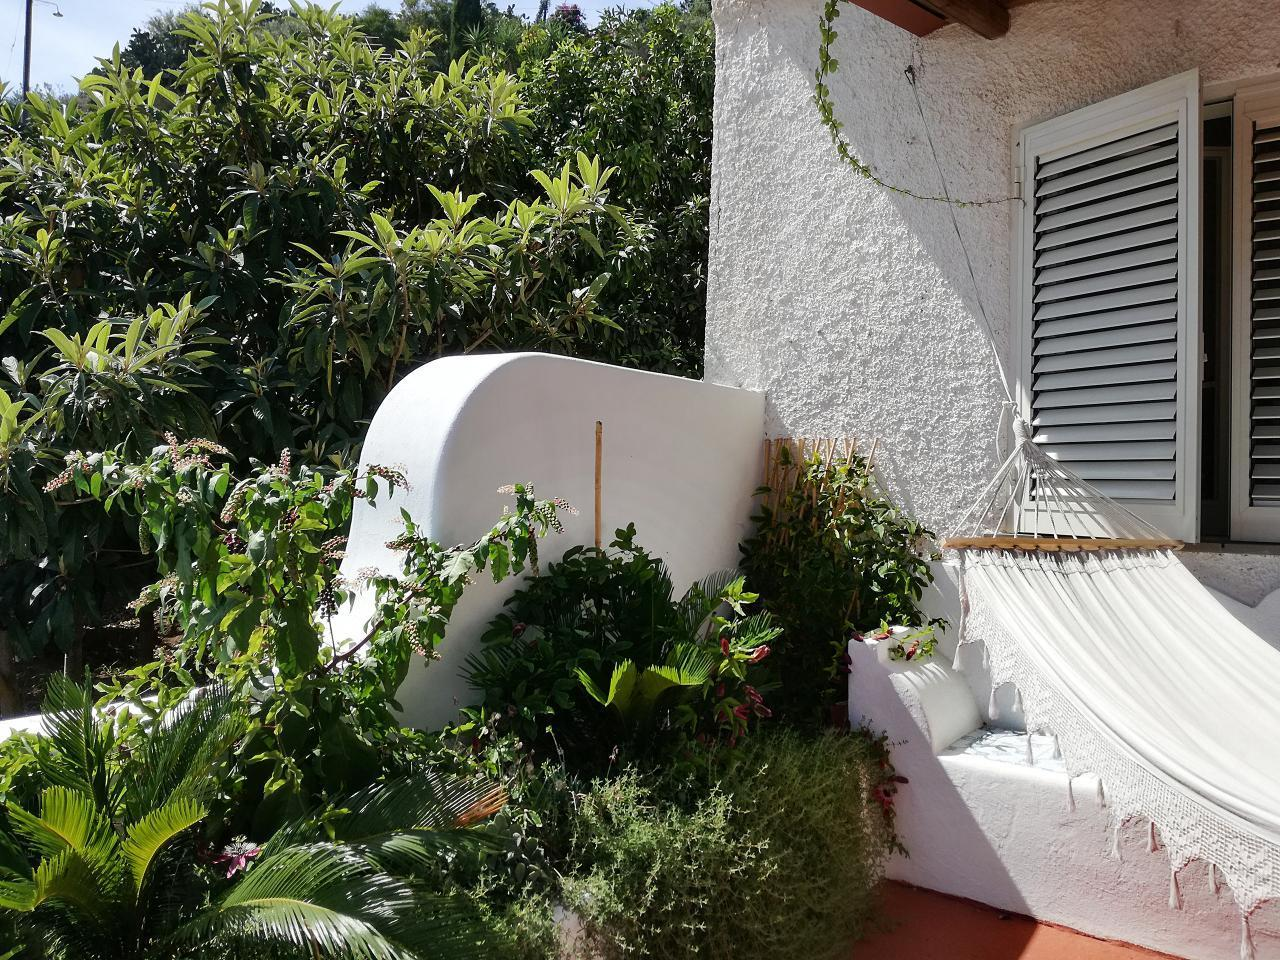 Maison de vacances Ferienhaushälfte Solandra auf sizilianischer Insel mit atemberaubenden Meeres-Rundblick (2038046), Lipari, Lipari, Sicile, Italie, image 54